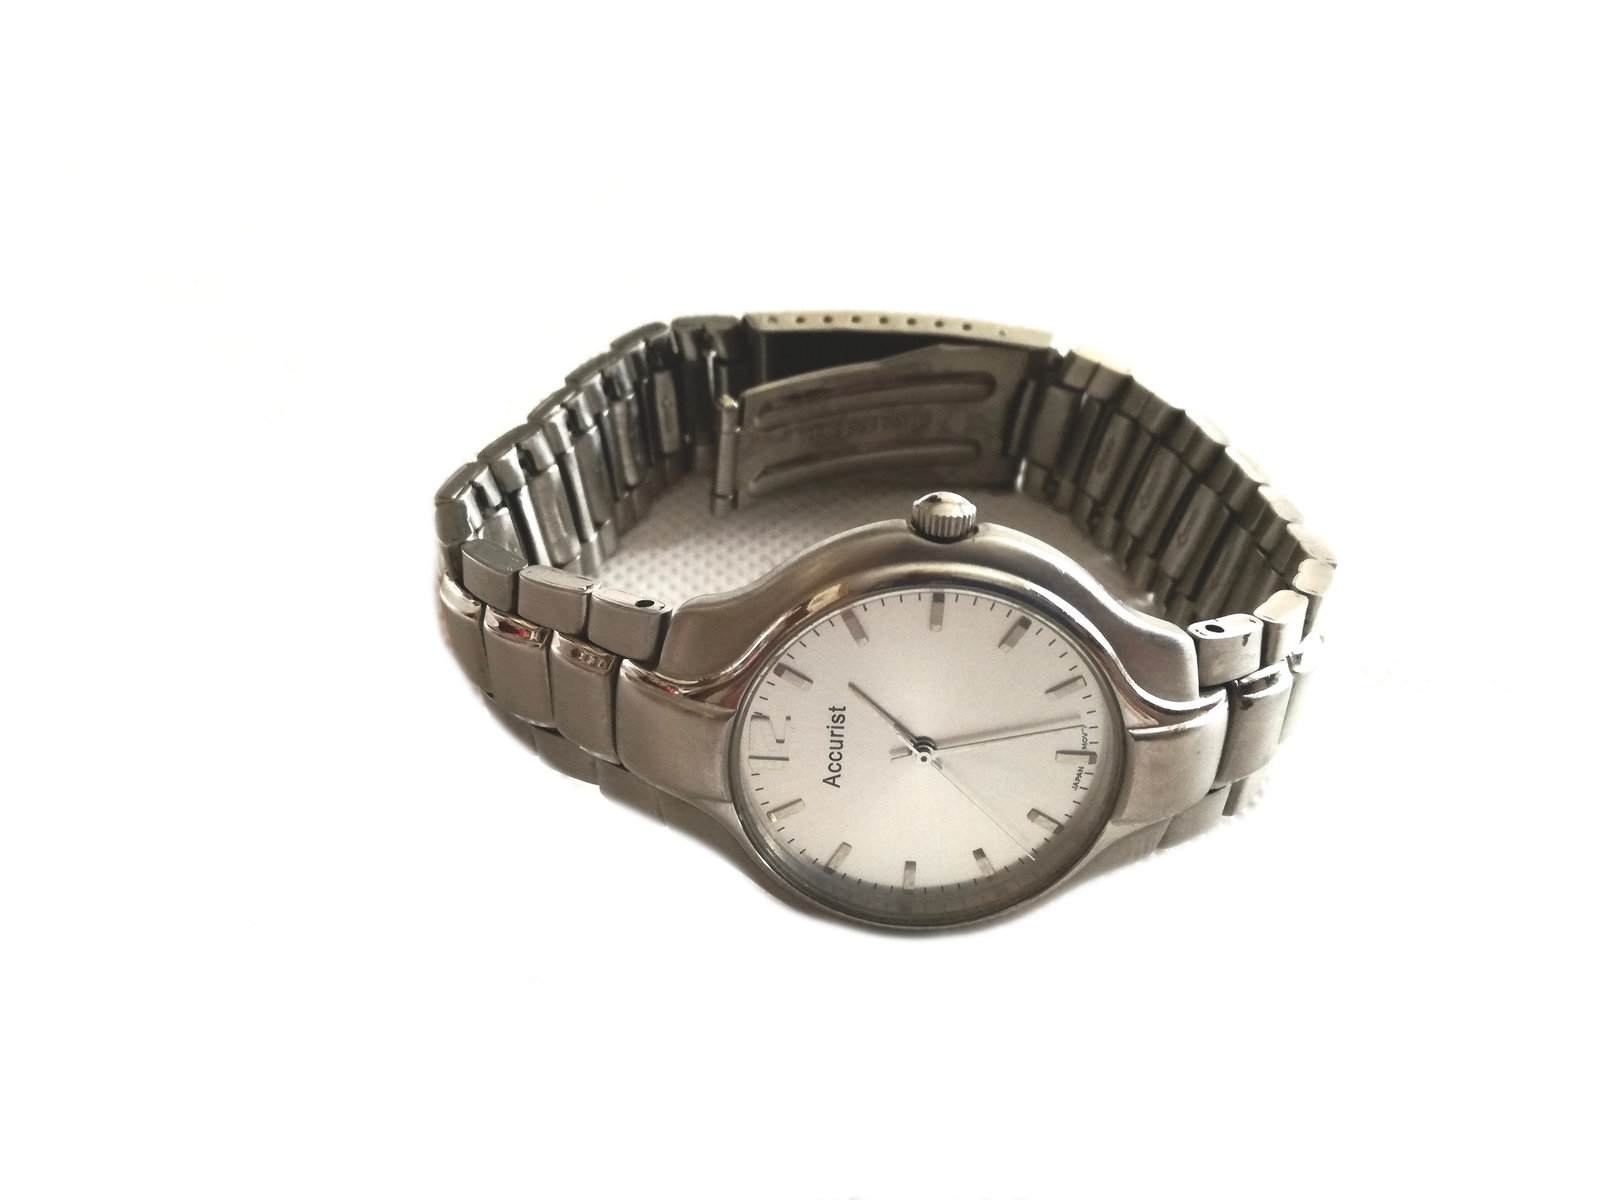 vintage watch / gift for him / vintage wrist watch / vintage  Accurist Watch / w image 5